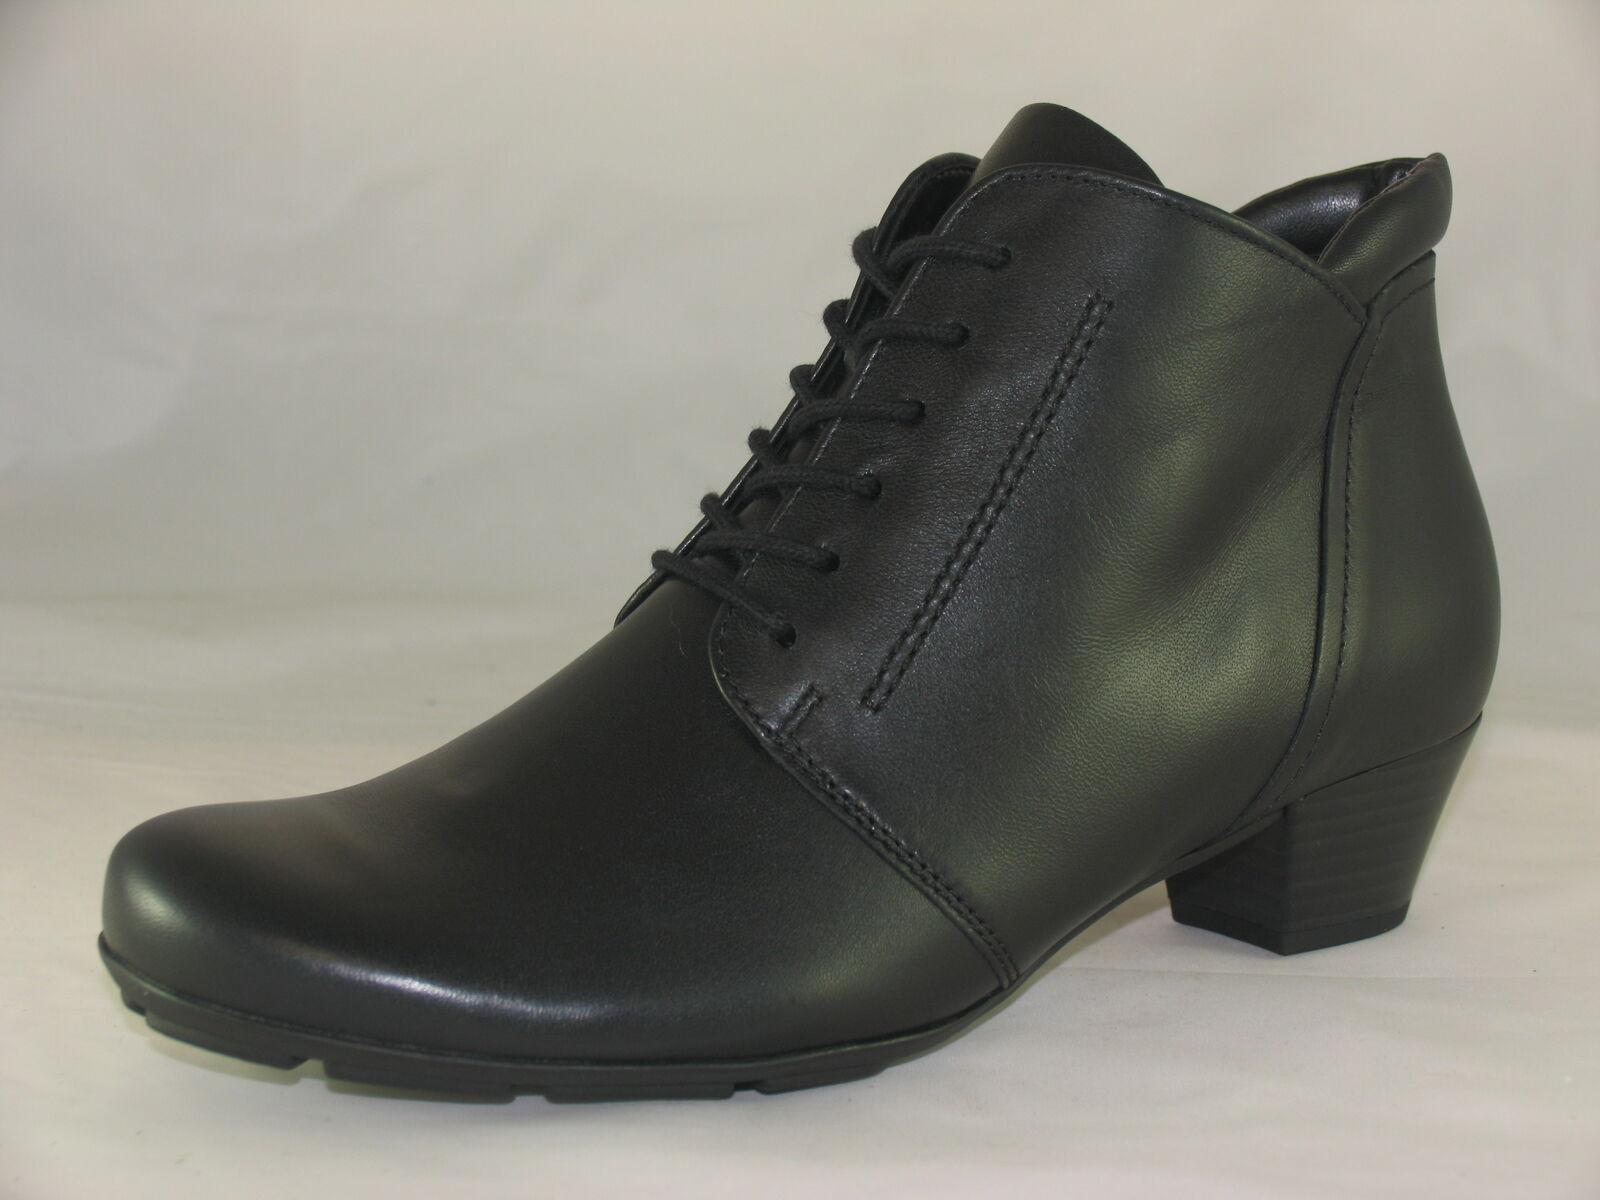 Women's Gabor 75.631 Black Ankle Boots